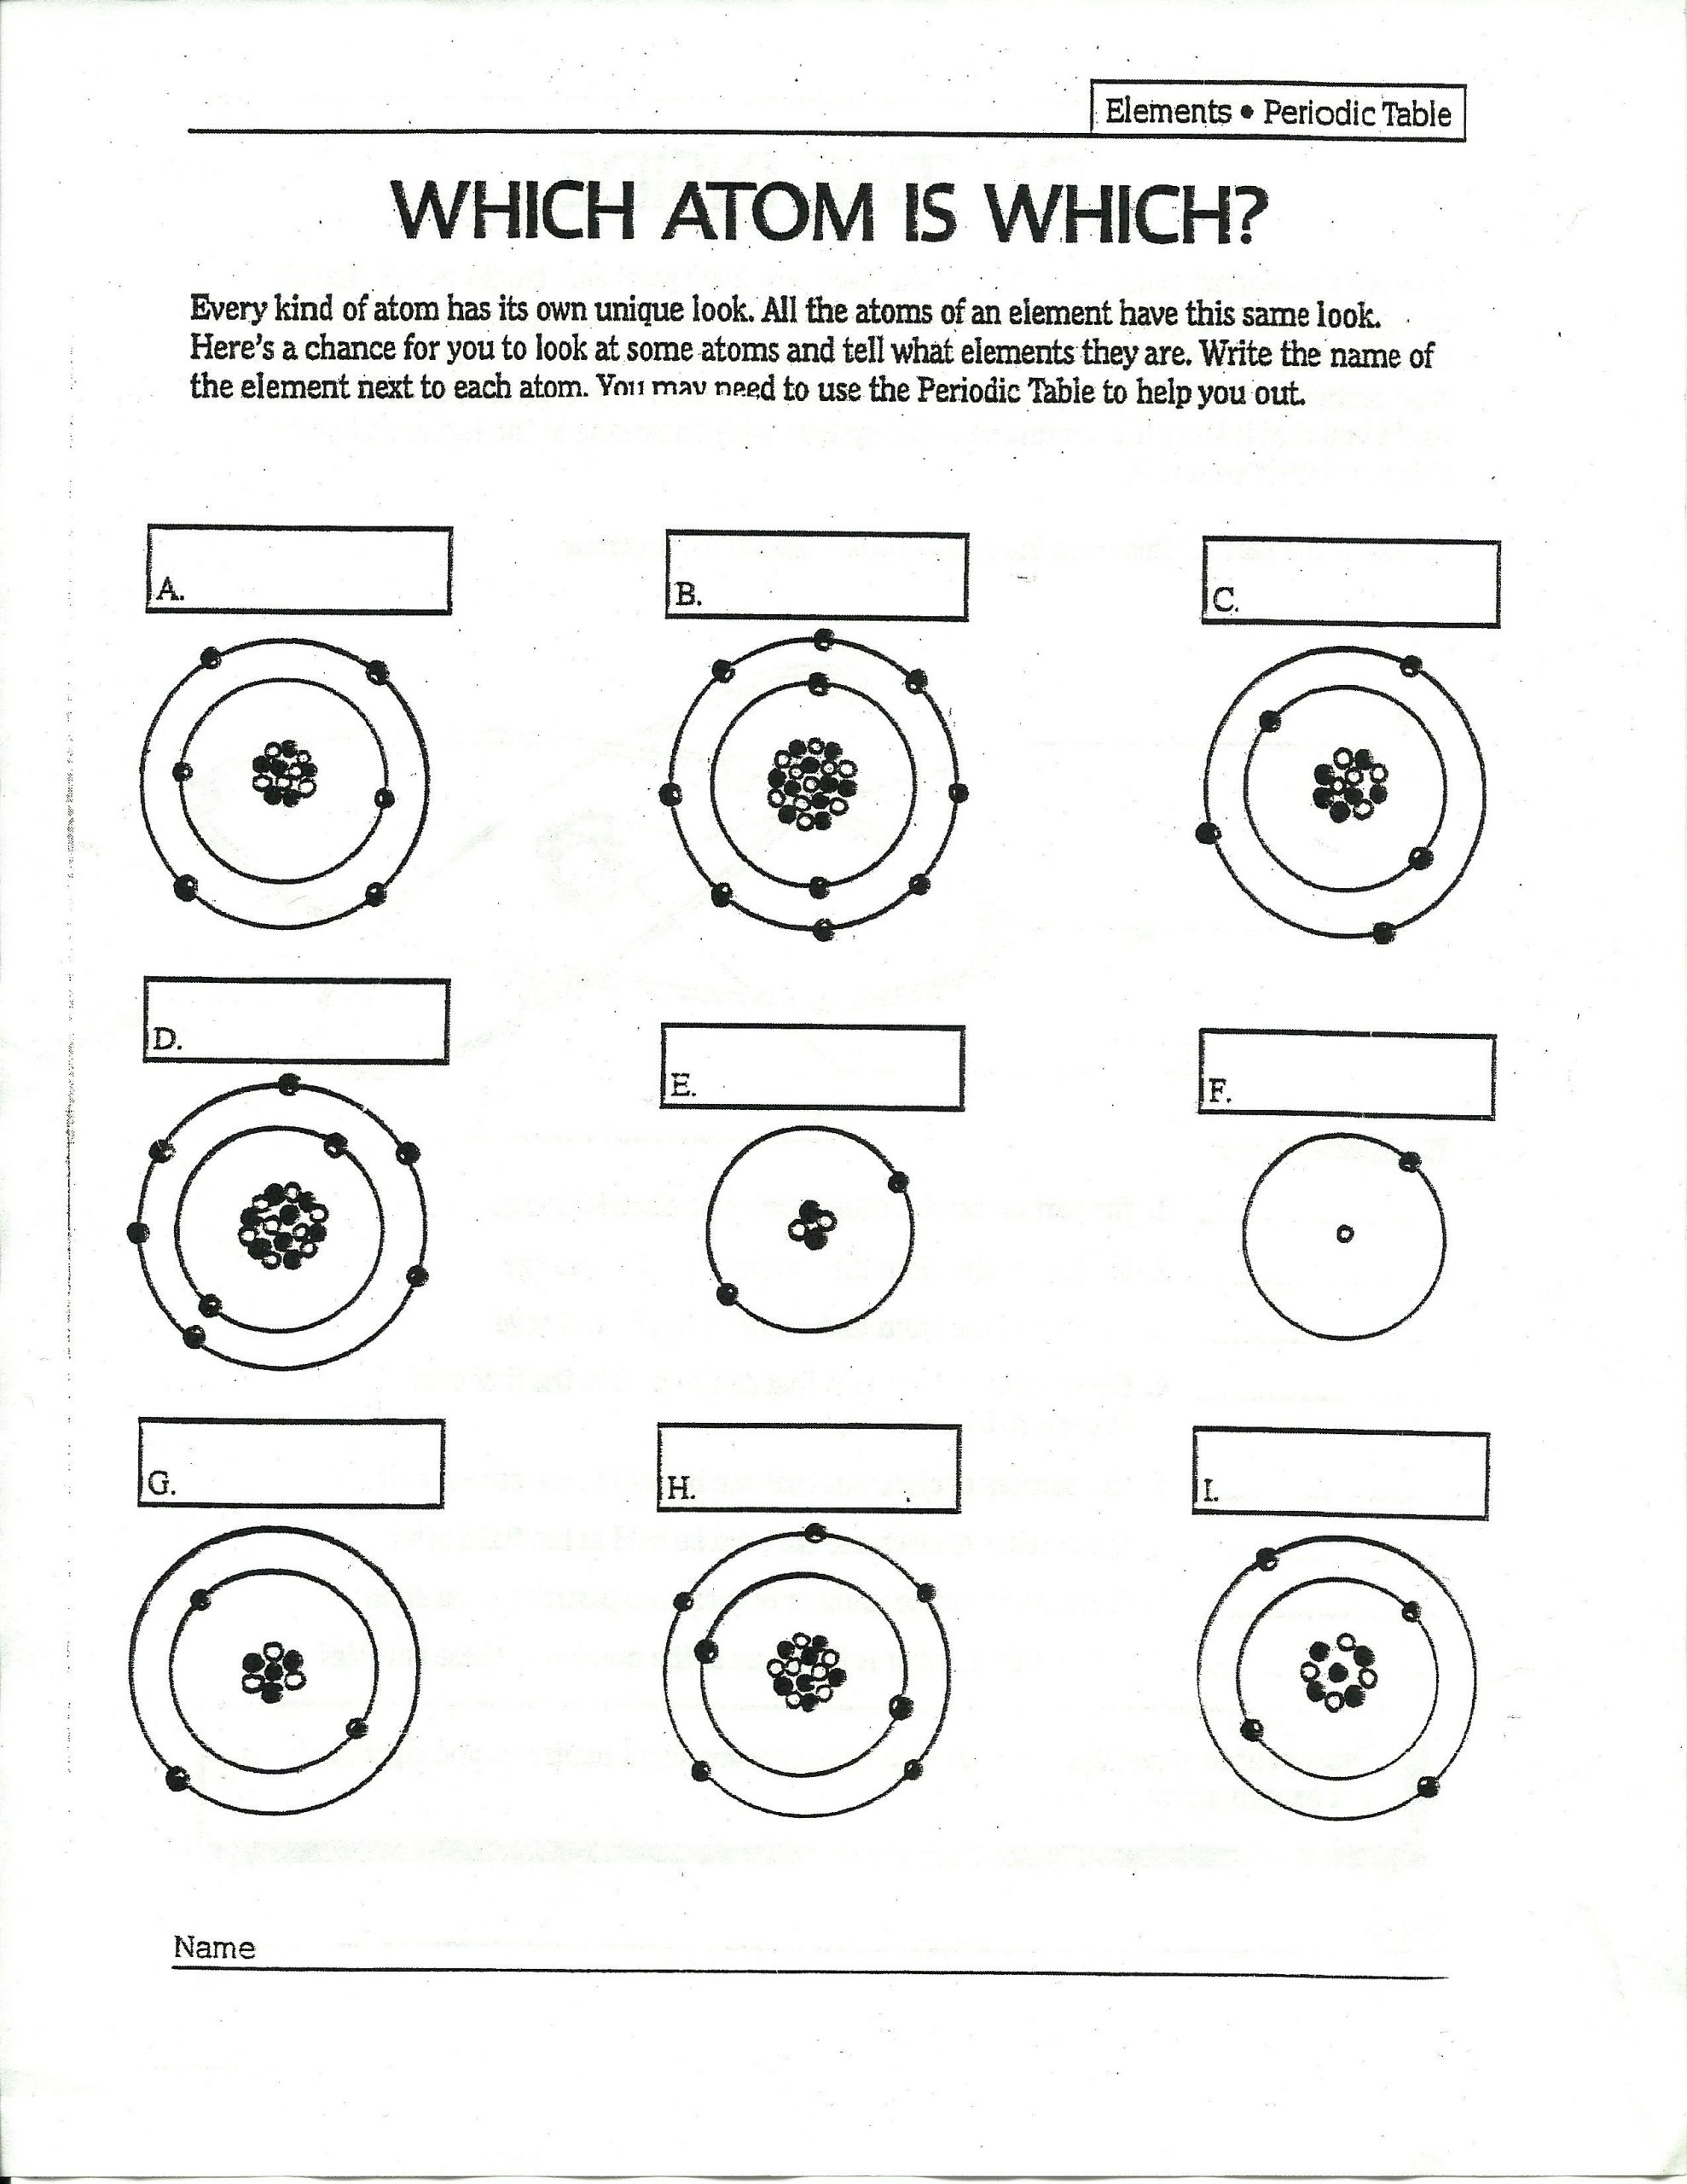 Bohr atomic Models Worksheet Answers 31 Bohr atomic Models Worksheet Free Worksheet Spreadsheet